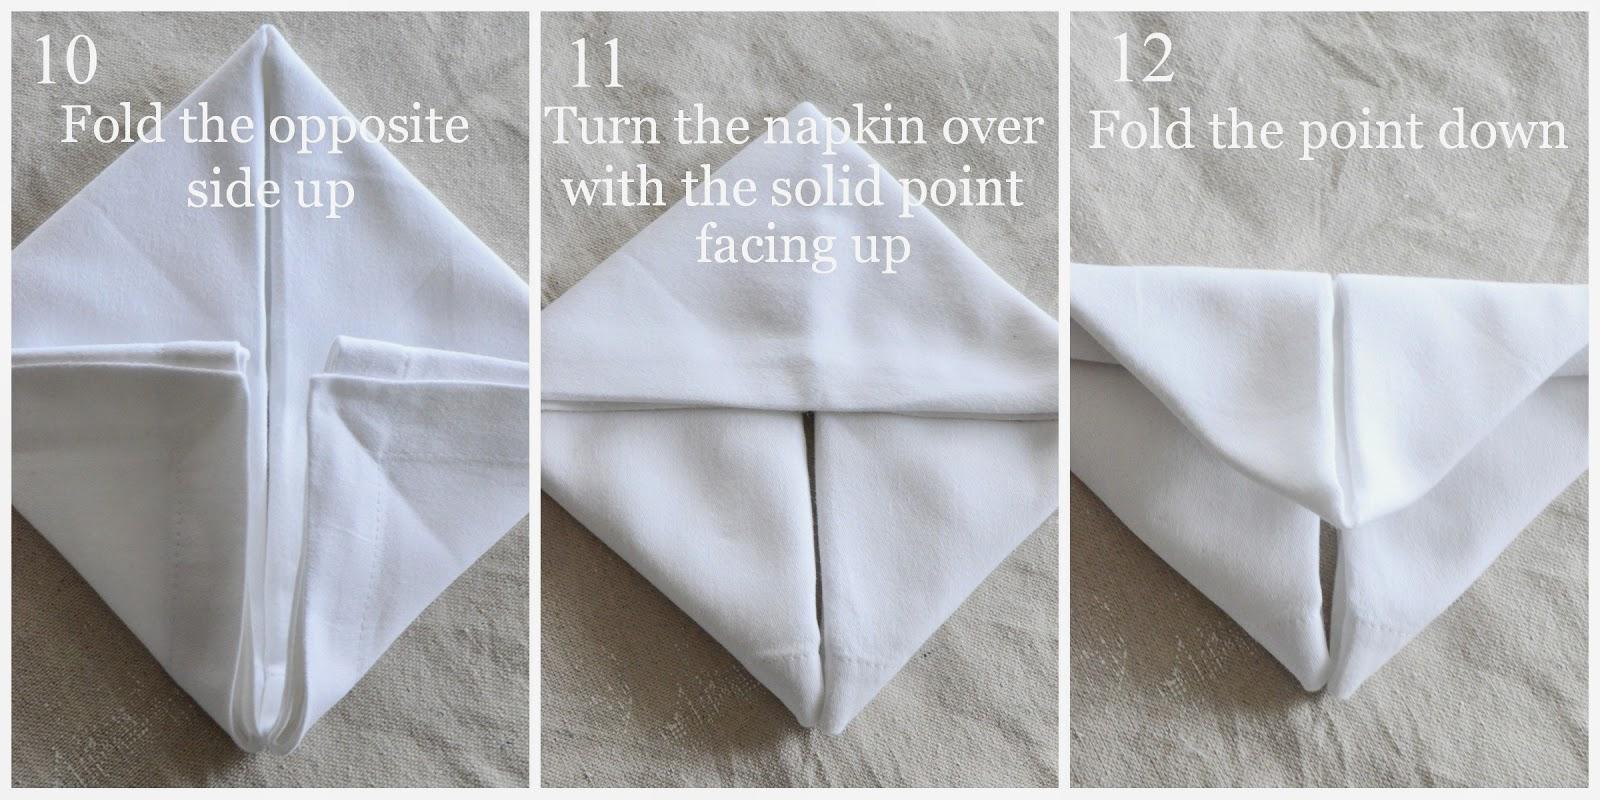 Bunny fold napkin diy interior design ideas for your modern home - Fold bunny shaped napkin ...